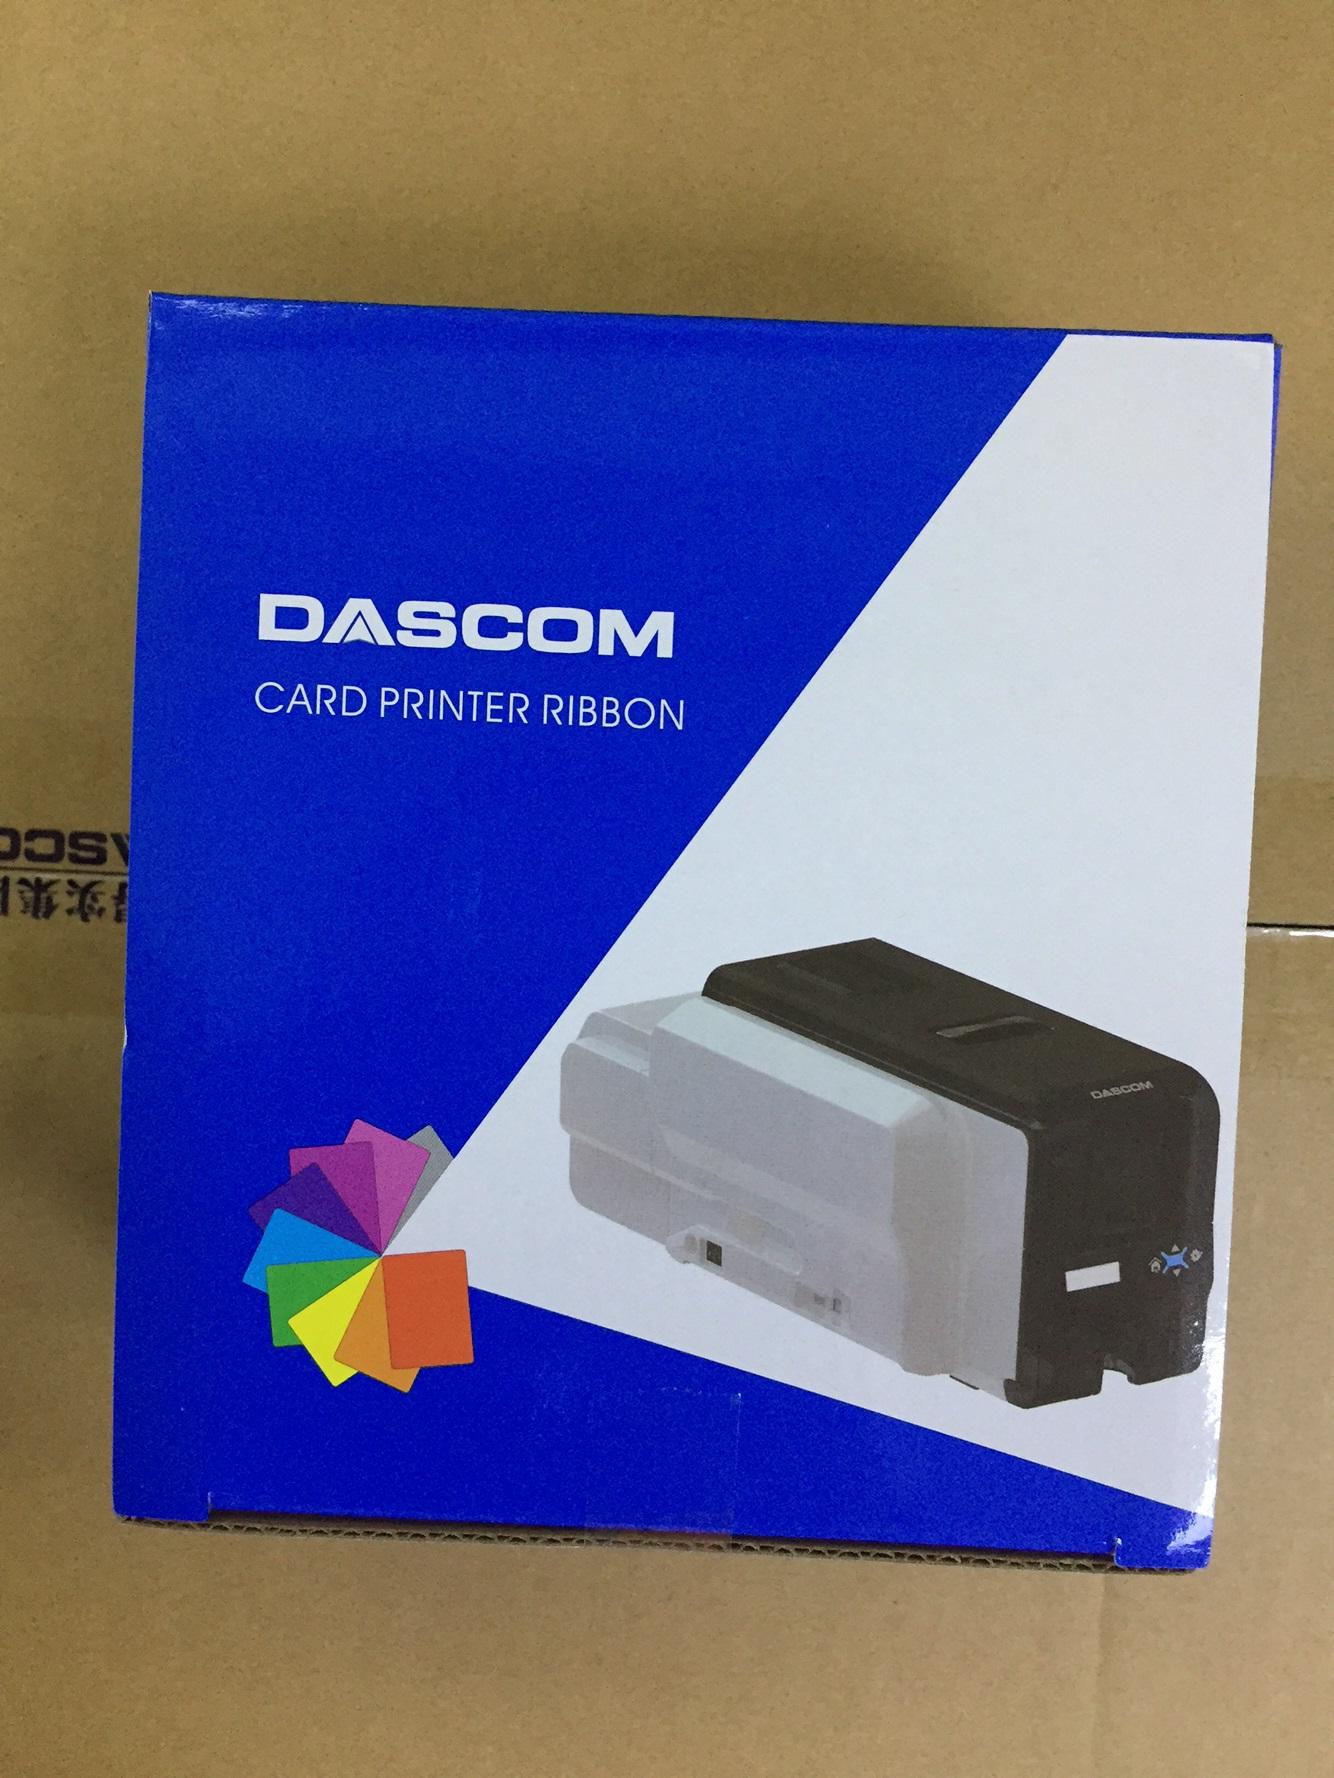 Solid card machine ribbon DC-3300 DCK-305 smart card printing machine color 27016001